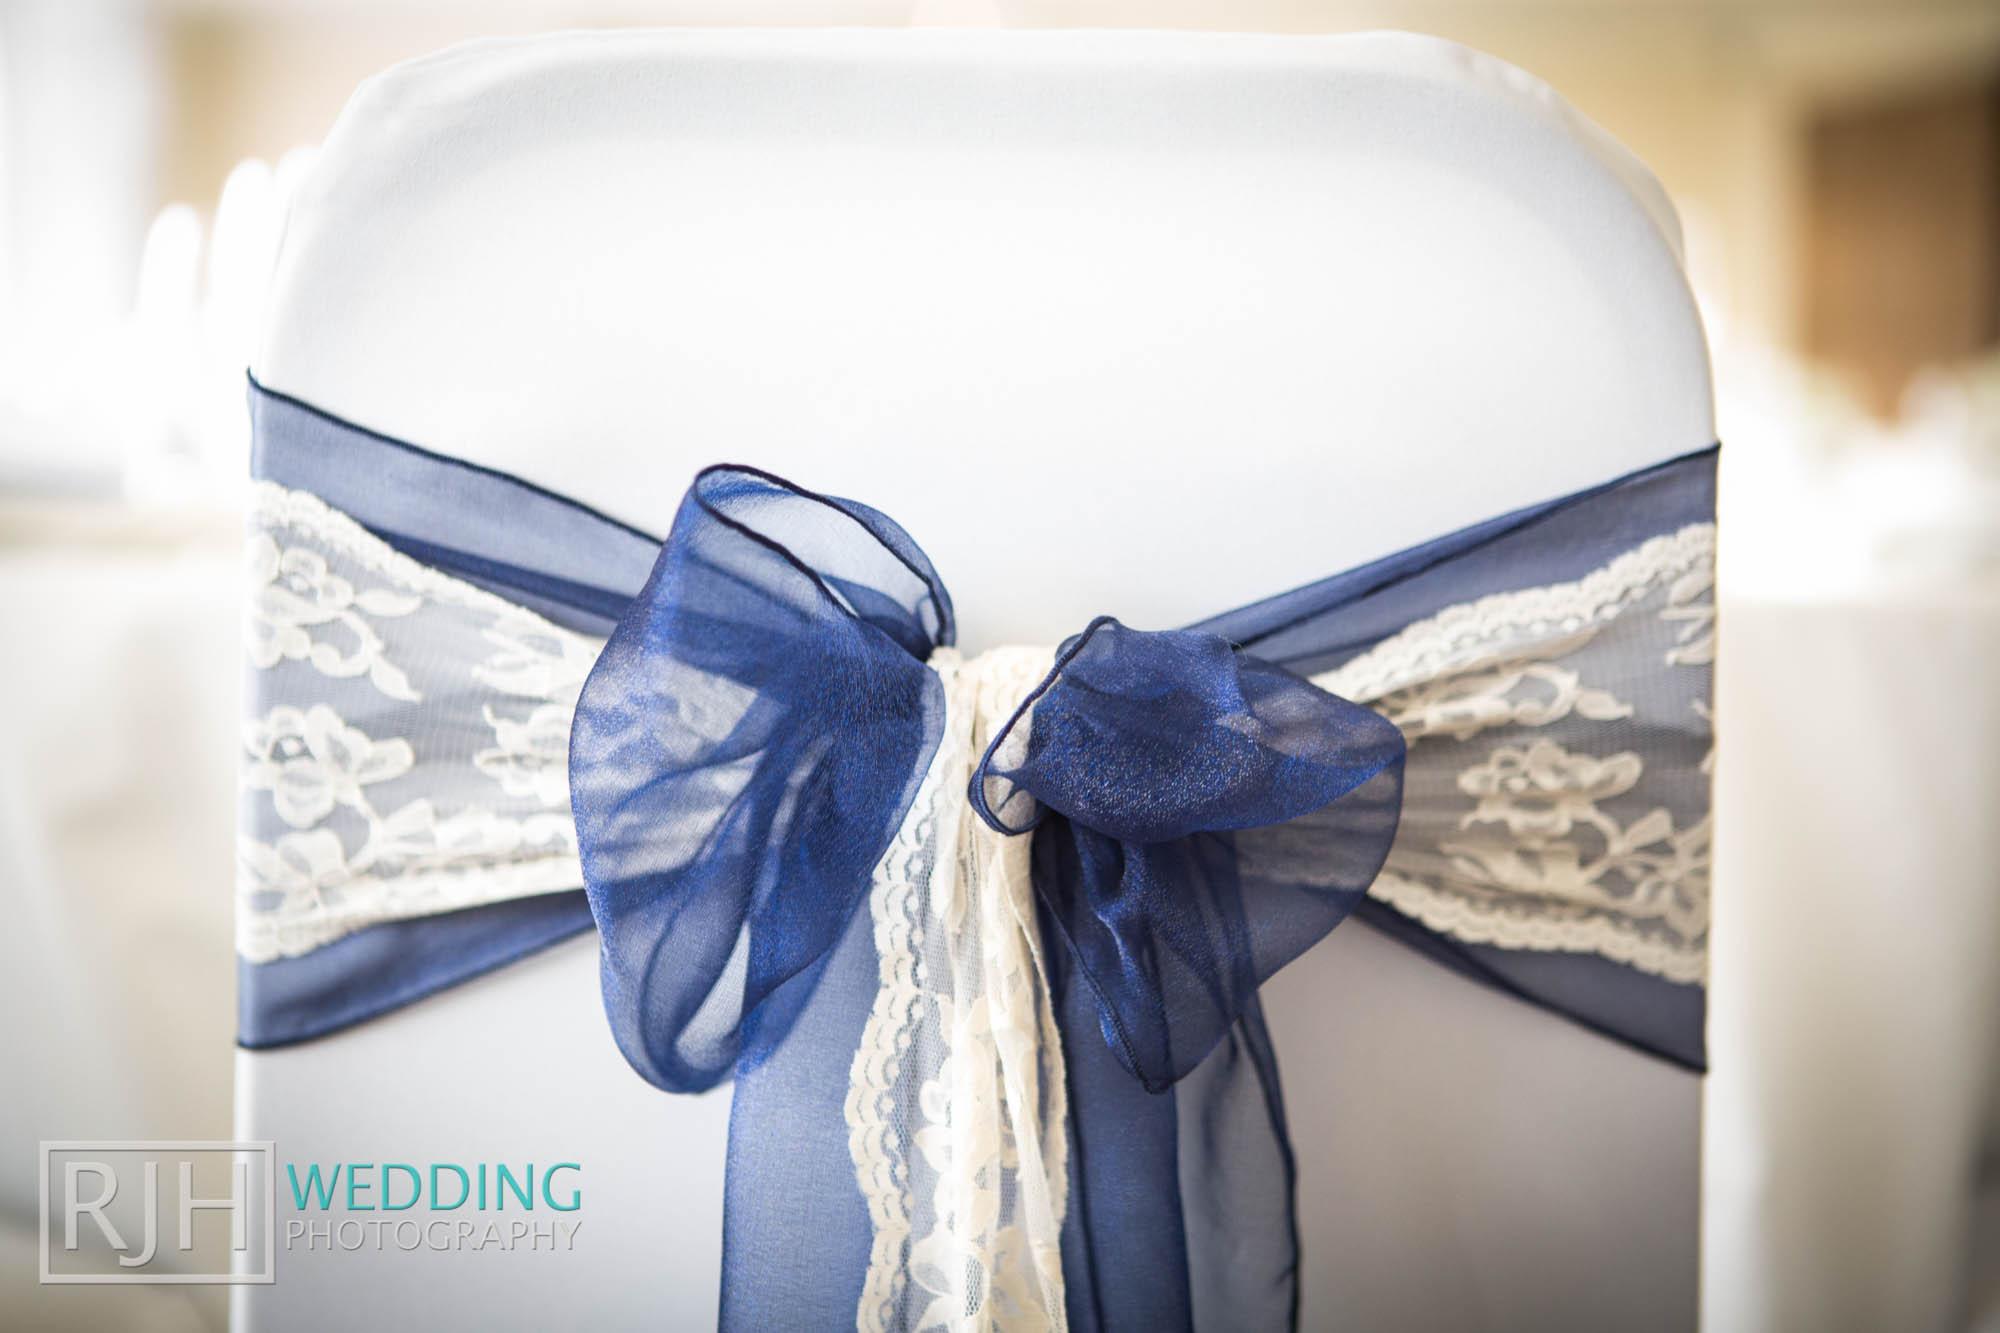 Whitley Hall Marples Wedding_31_3C2A8477.jpg